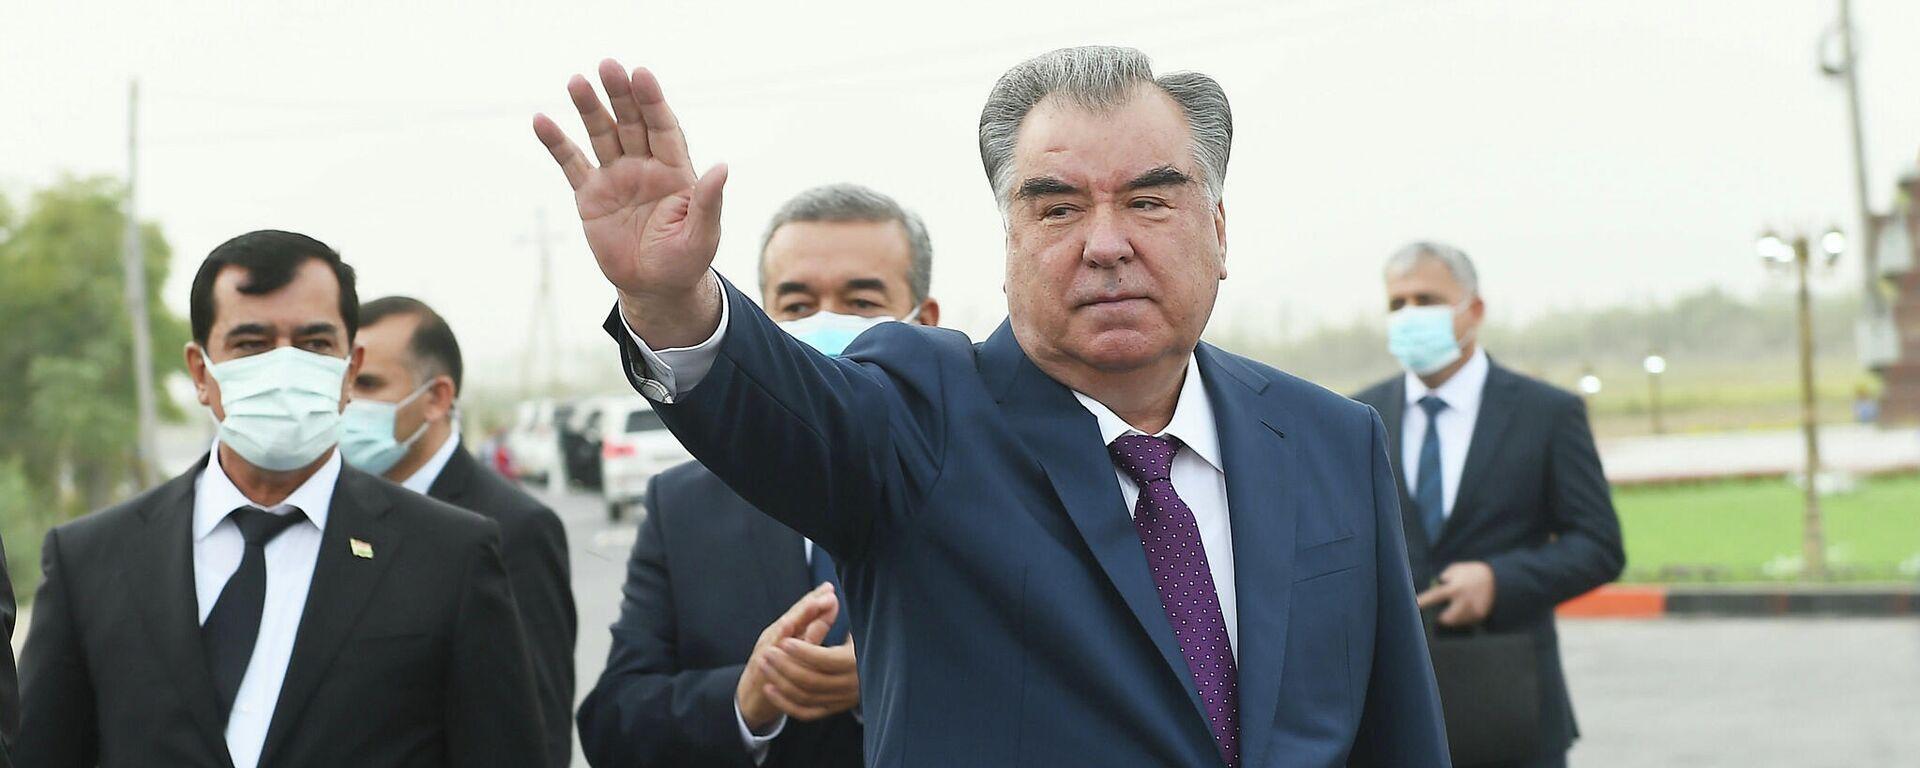 Президент Республики Таджикистан Эмомали Рахмон - Sputnik Тоҷикистон, 1920, 04.10.2021